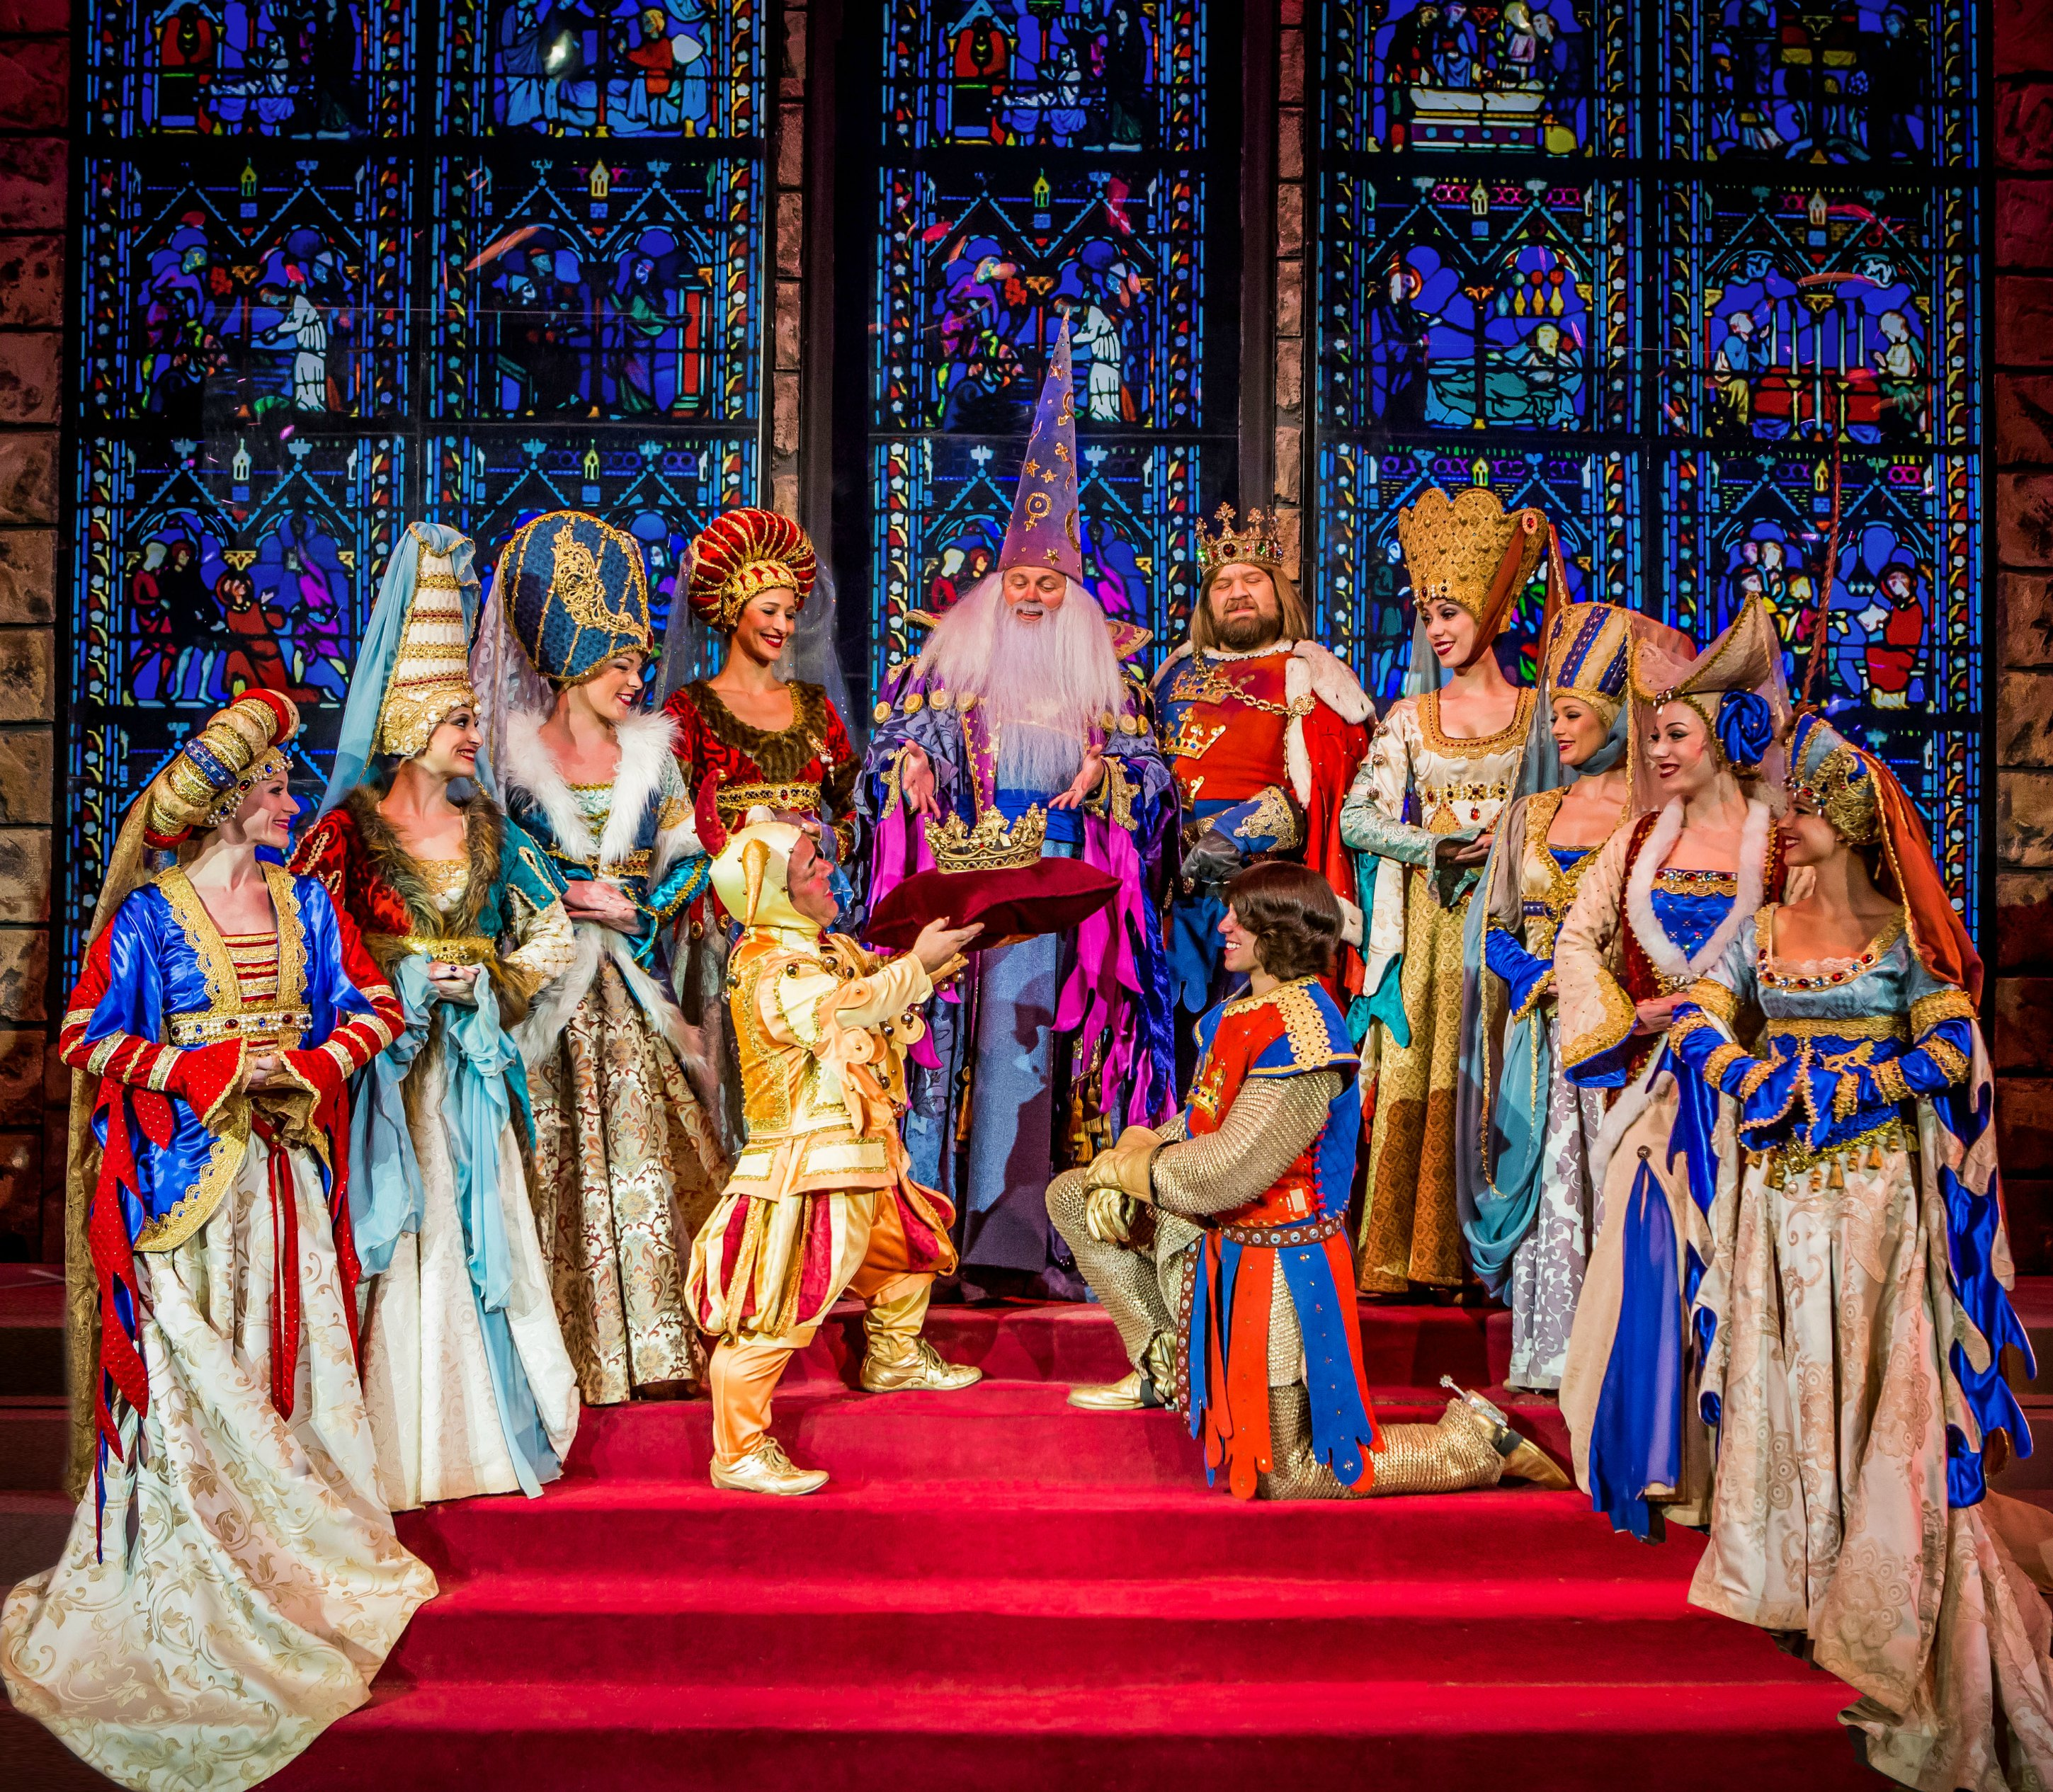 Excalibur - Tournament of Kings - Coronation - Photo by Erik Kabik (large file size)